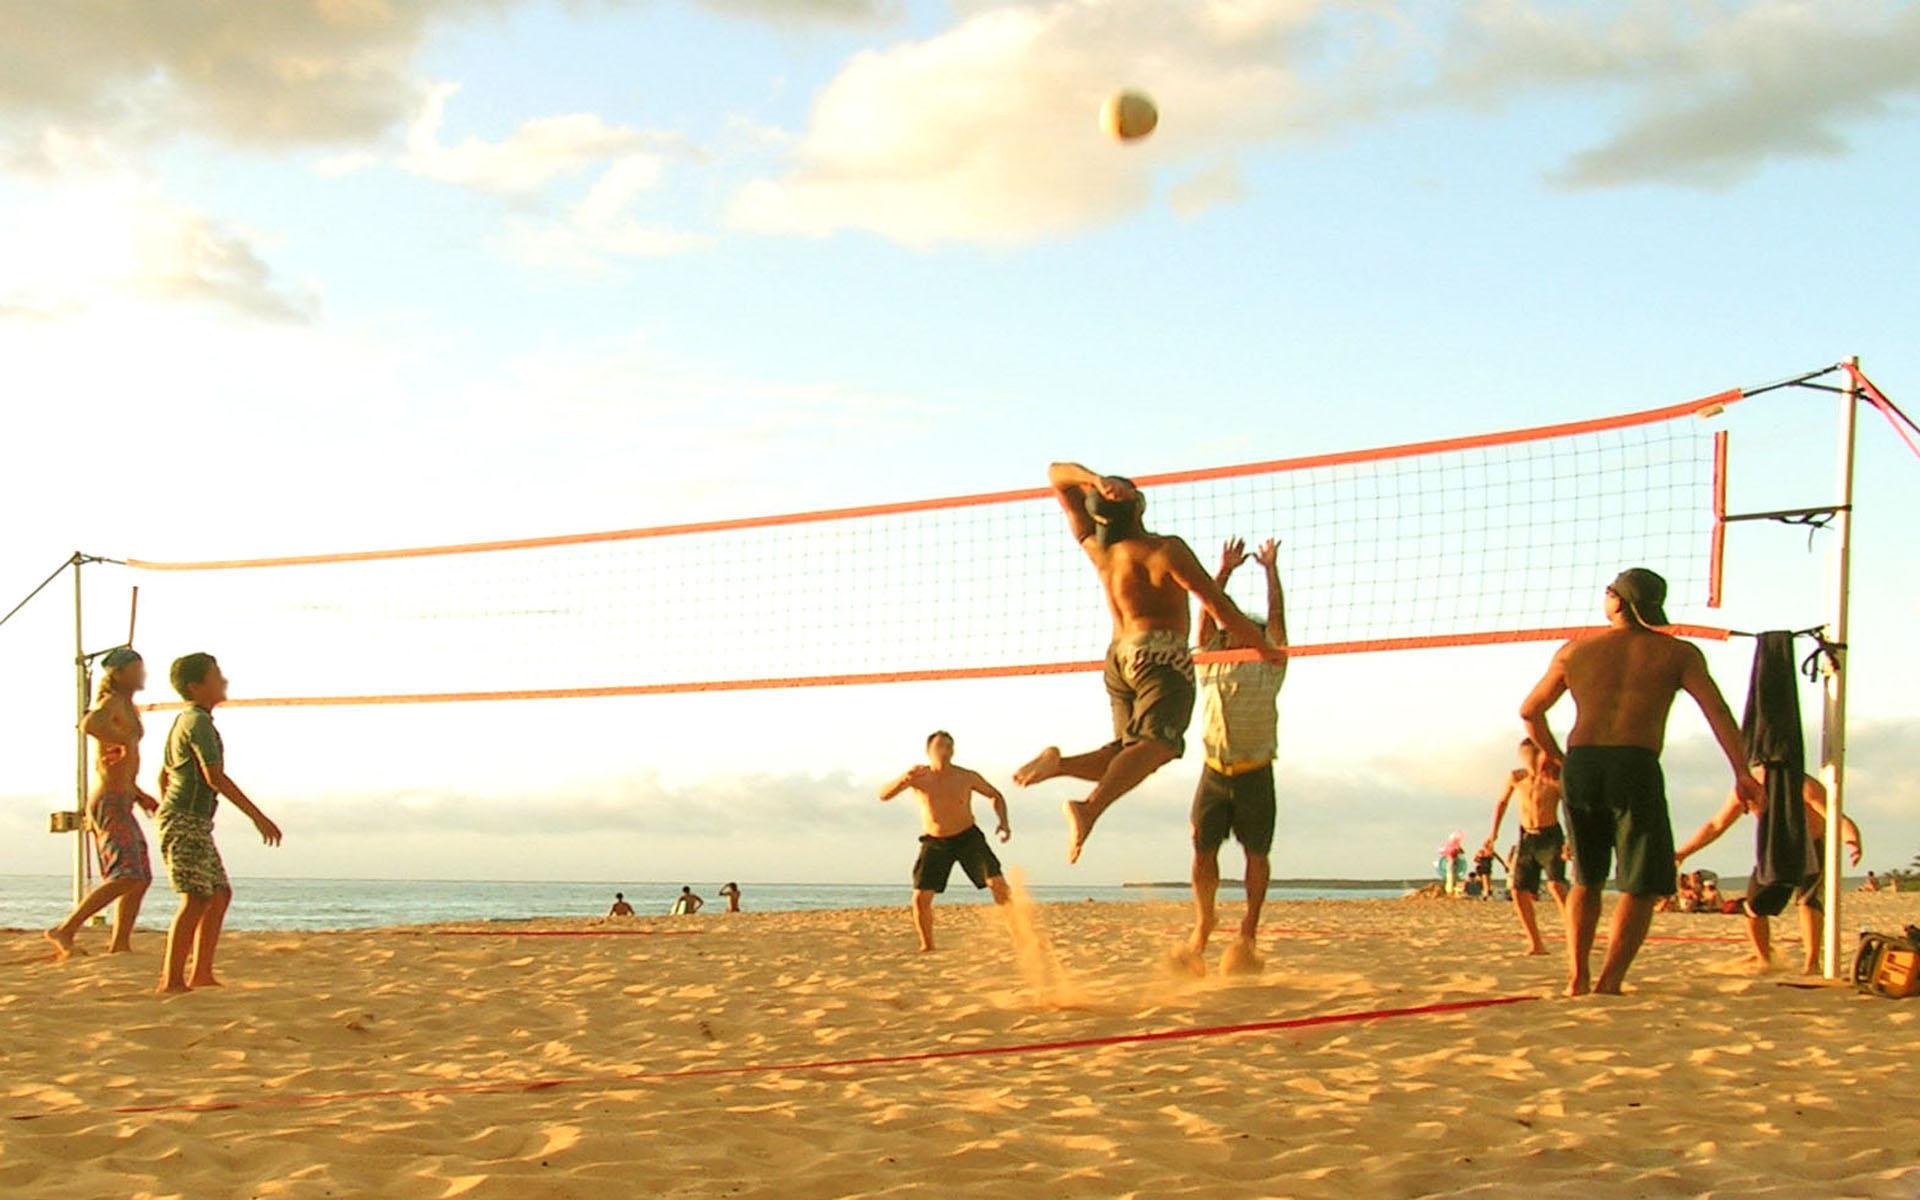 Wallpaper Volley Girl Volleyball Backgrounds Pixelstalk Net